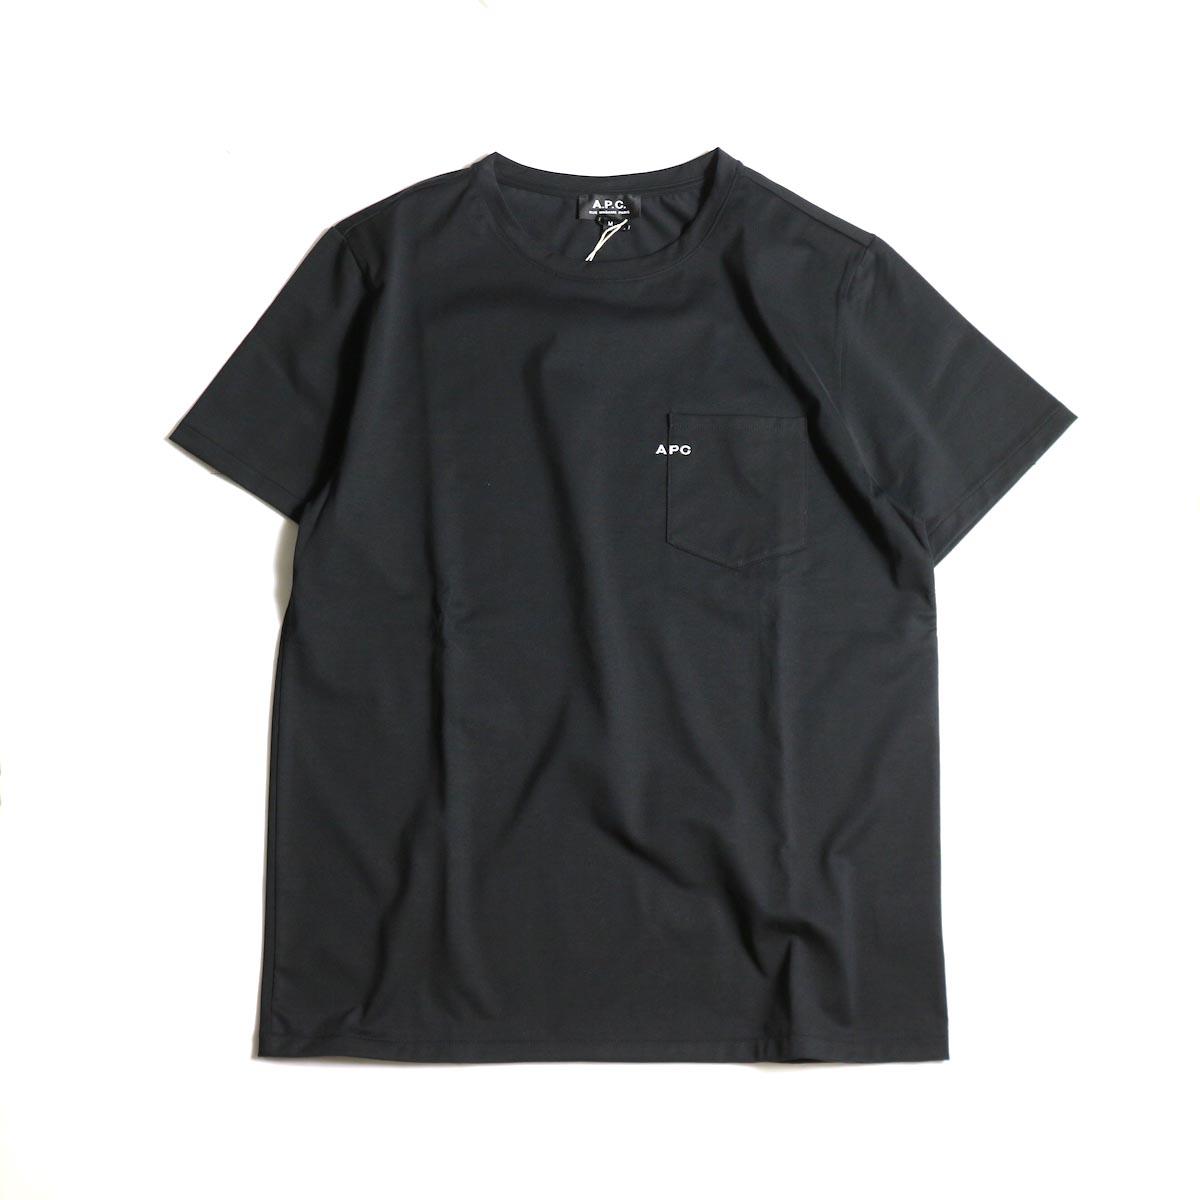 A.P.C. / Crew Neck Emb Pocket Tee -Black正面